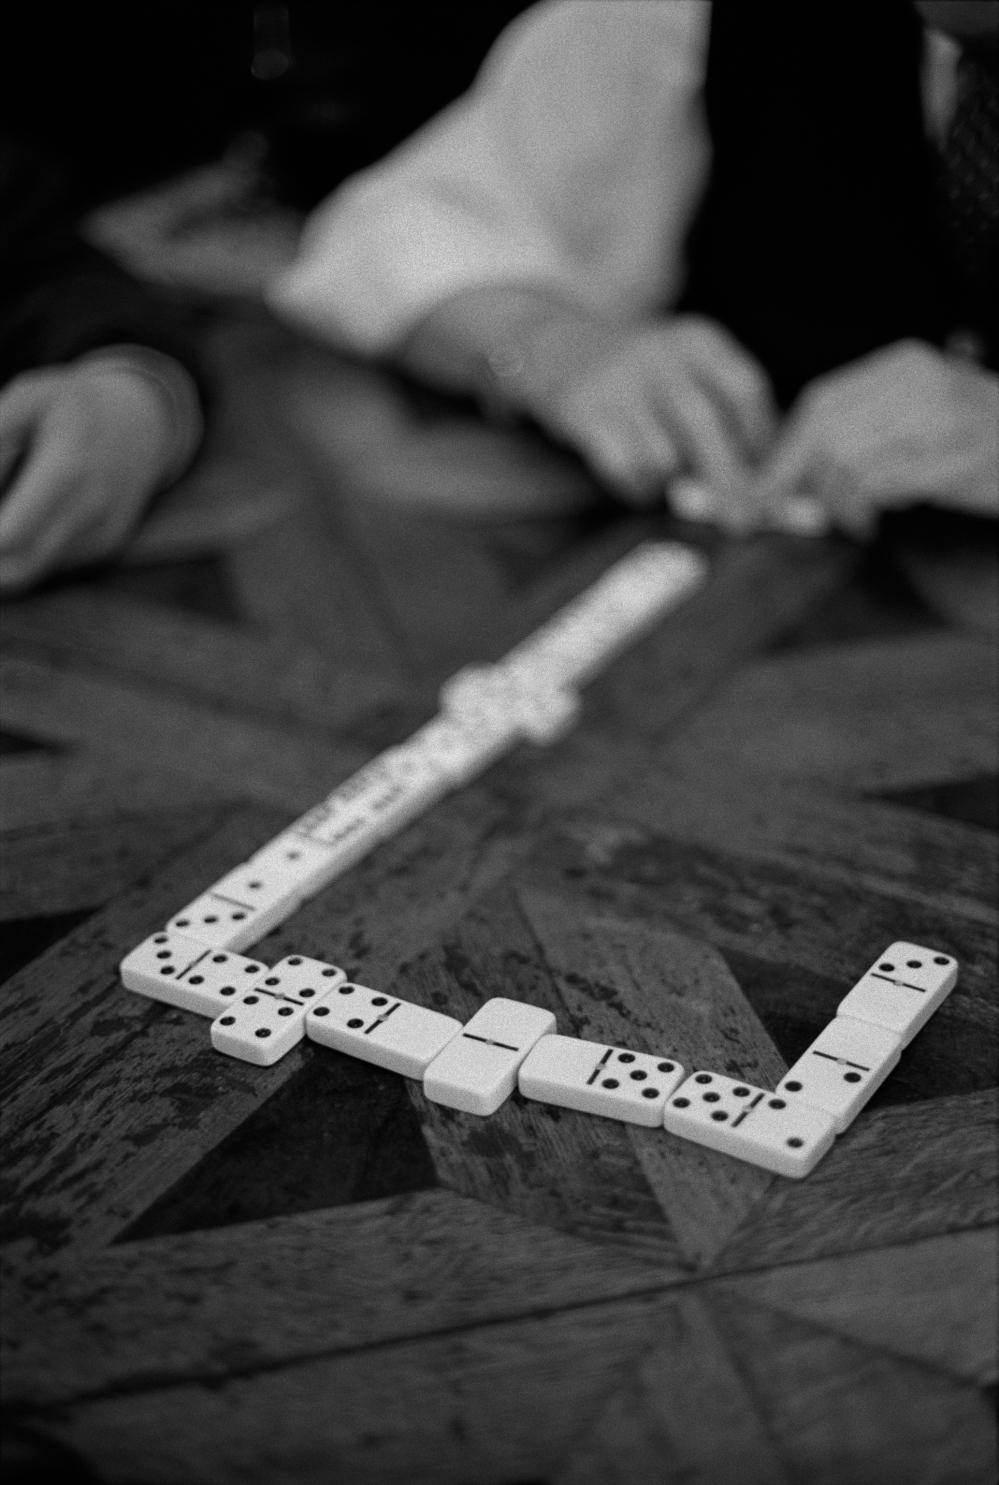 105-2010-Valpo-dominos-19